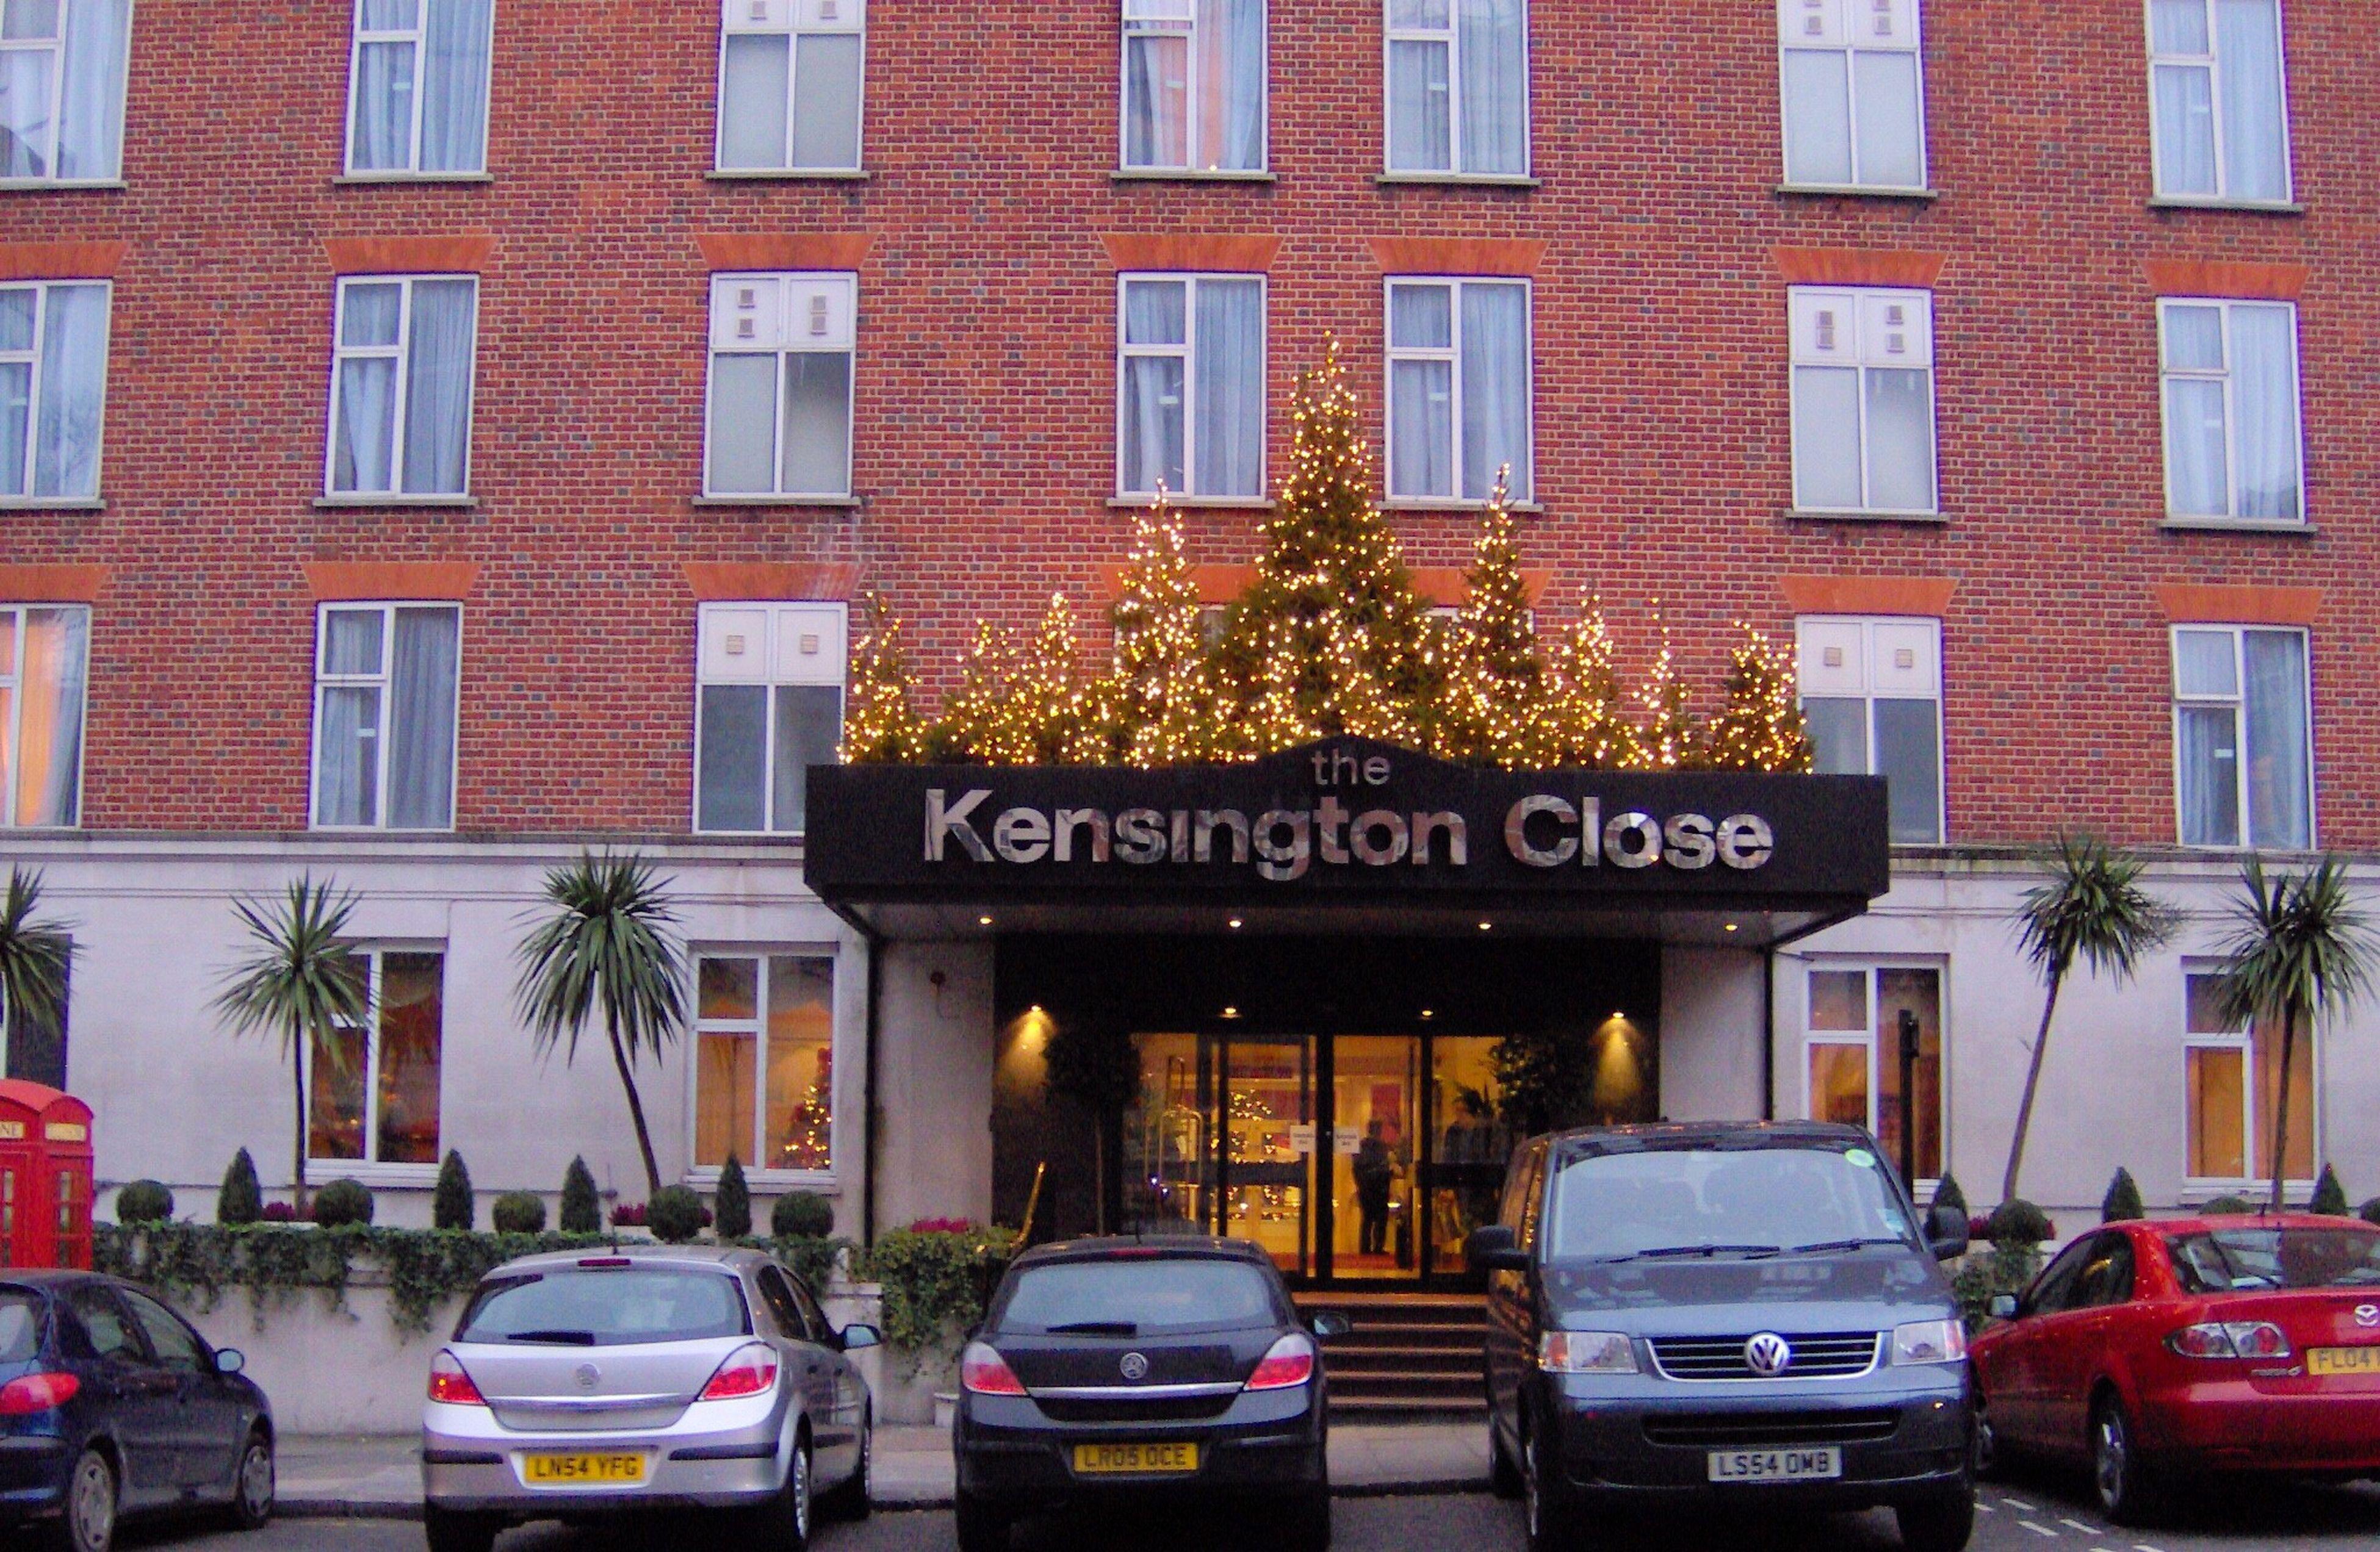 Kensington Hotel London England